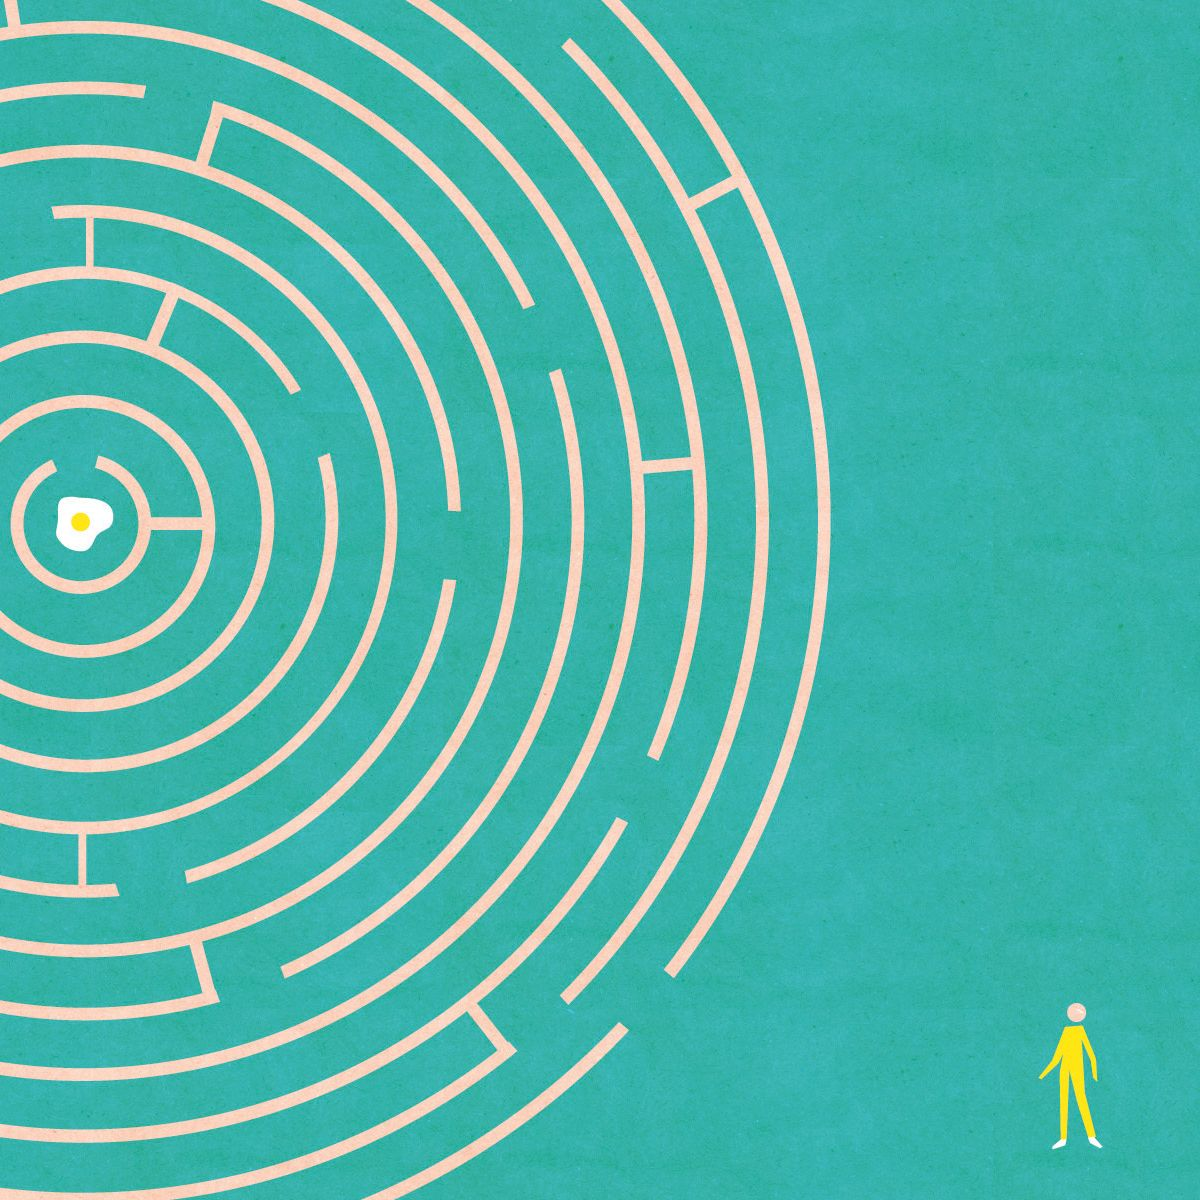 Pomo 1116 editors note illustration maze cgtibn